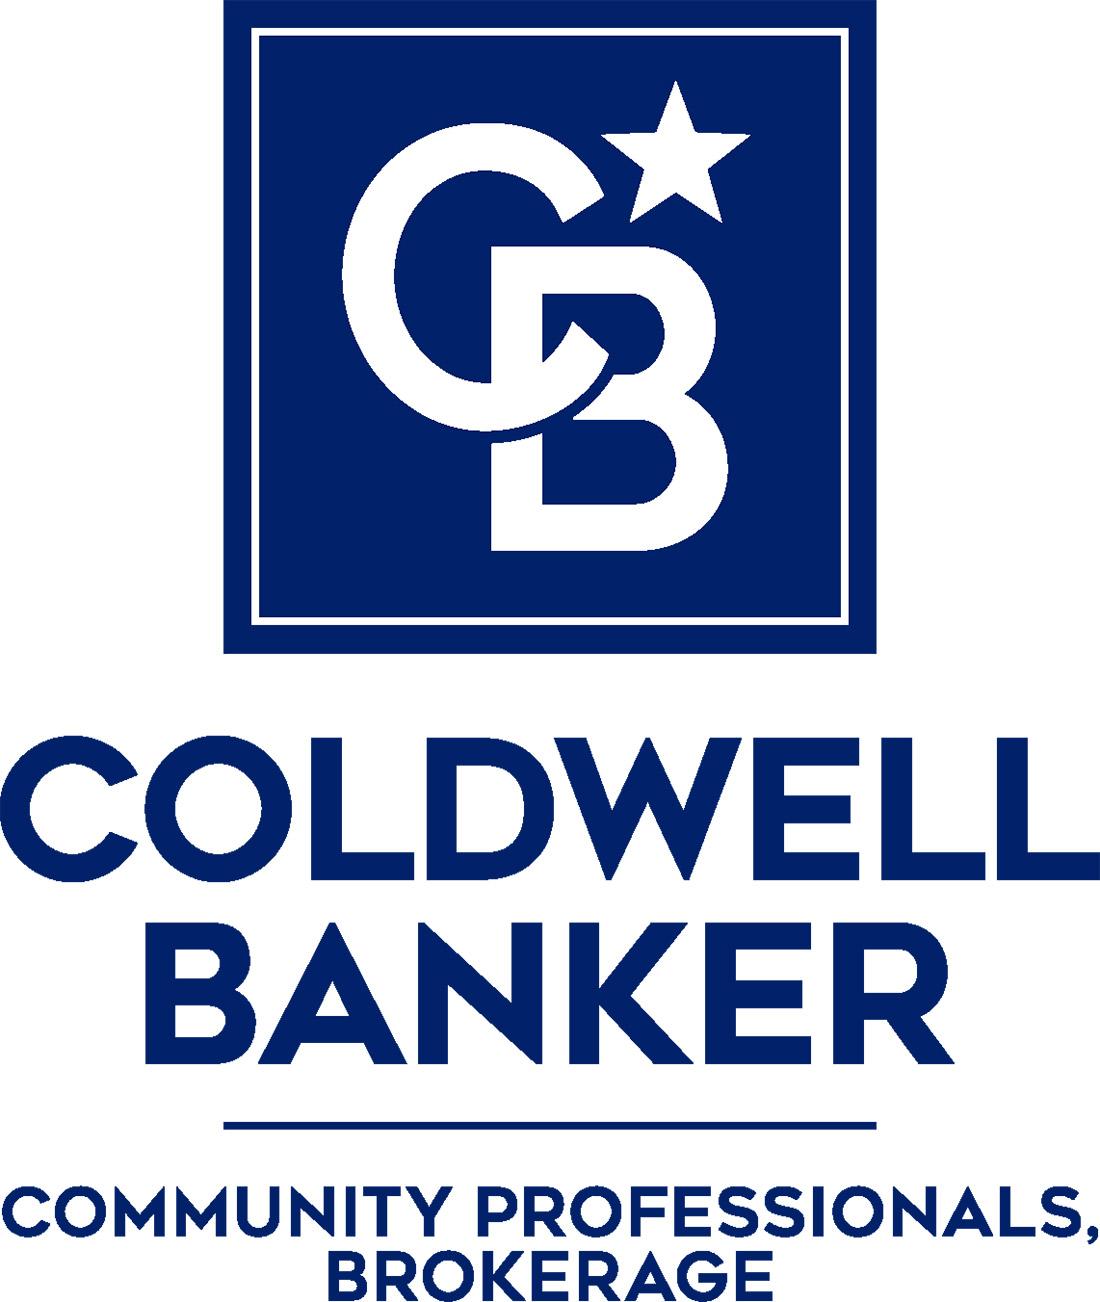 Melissa DeMartino - Coldwell Banker Community Professionals Logo